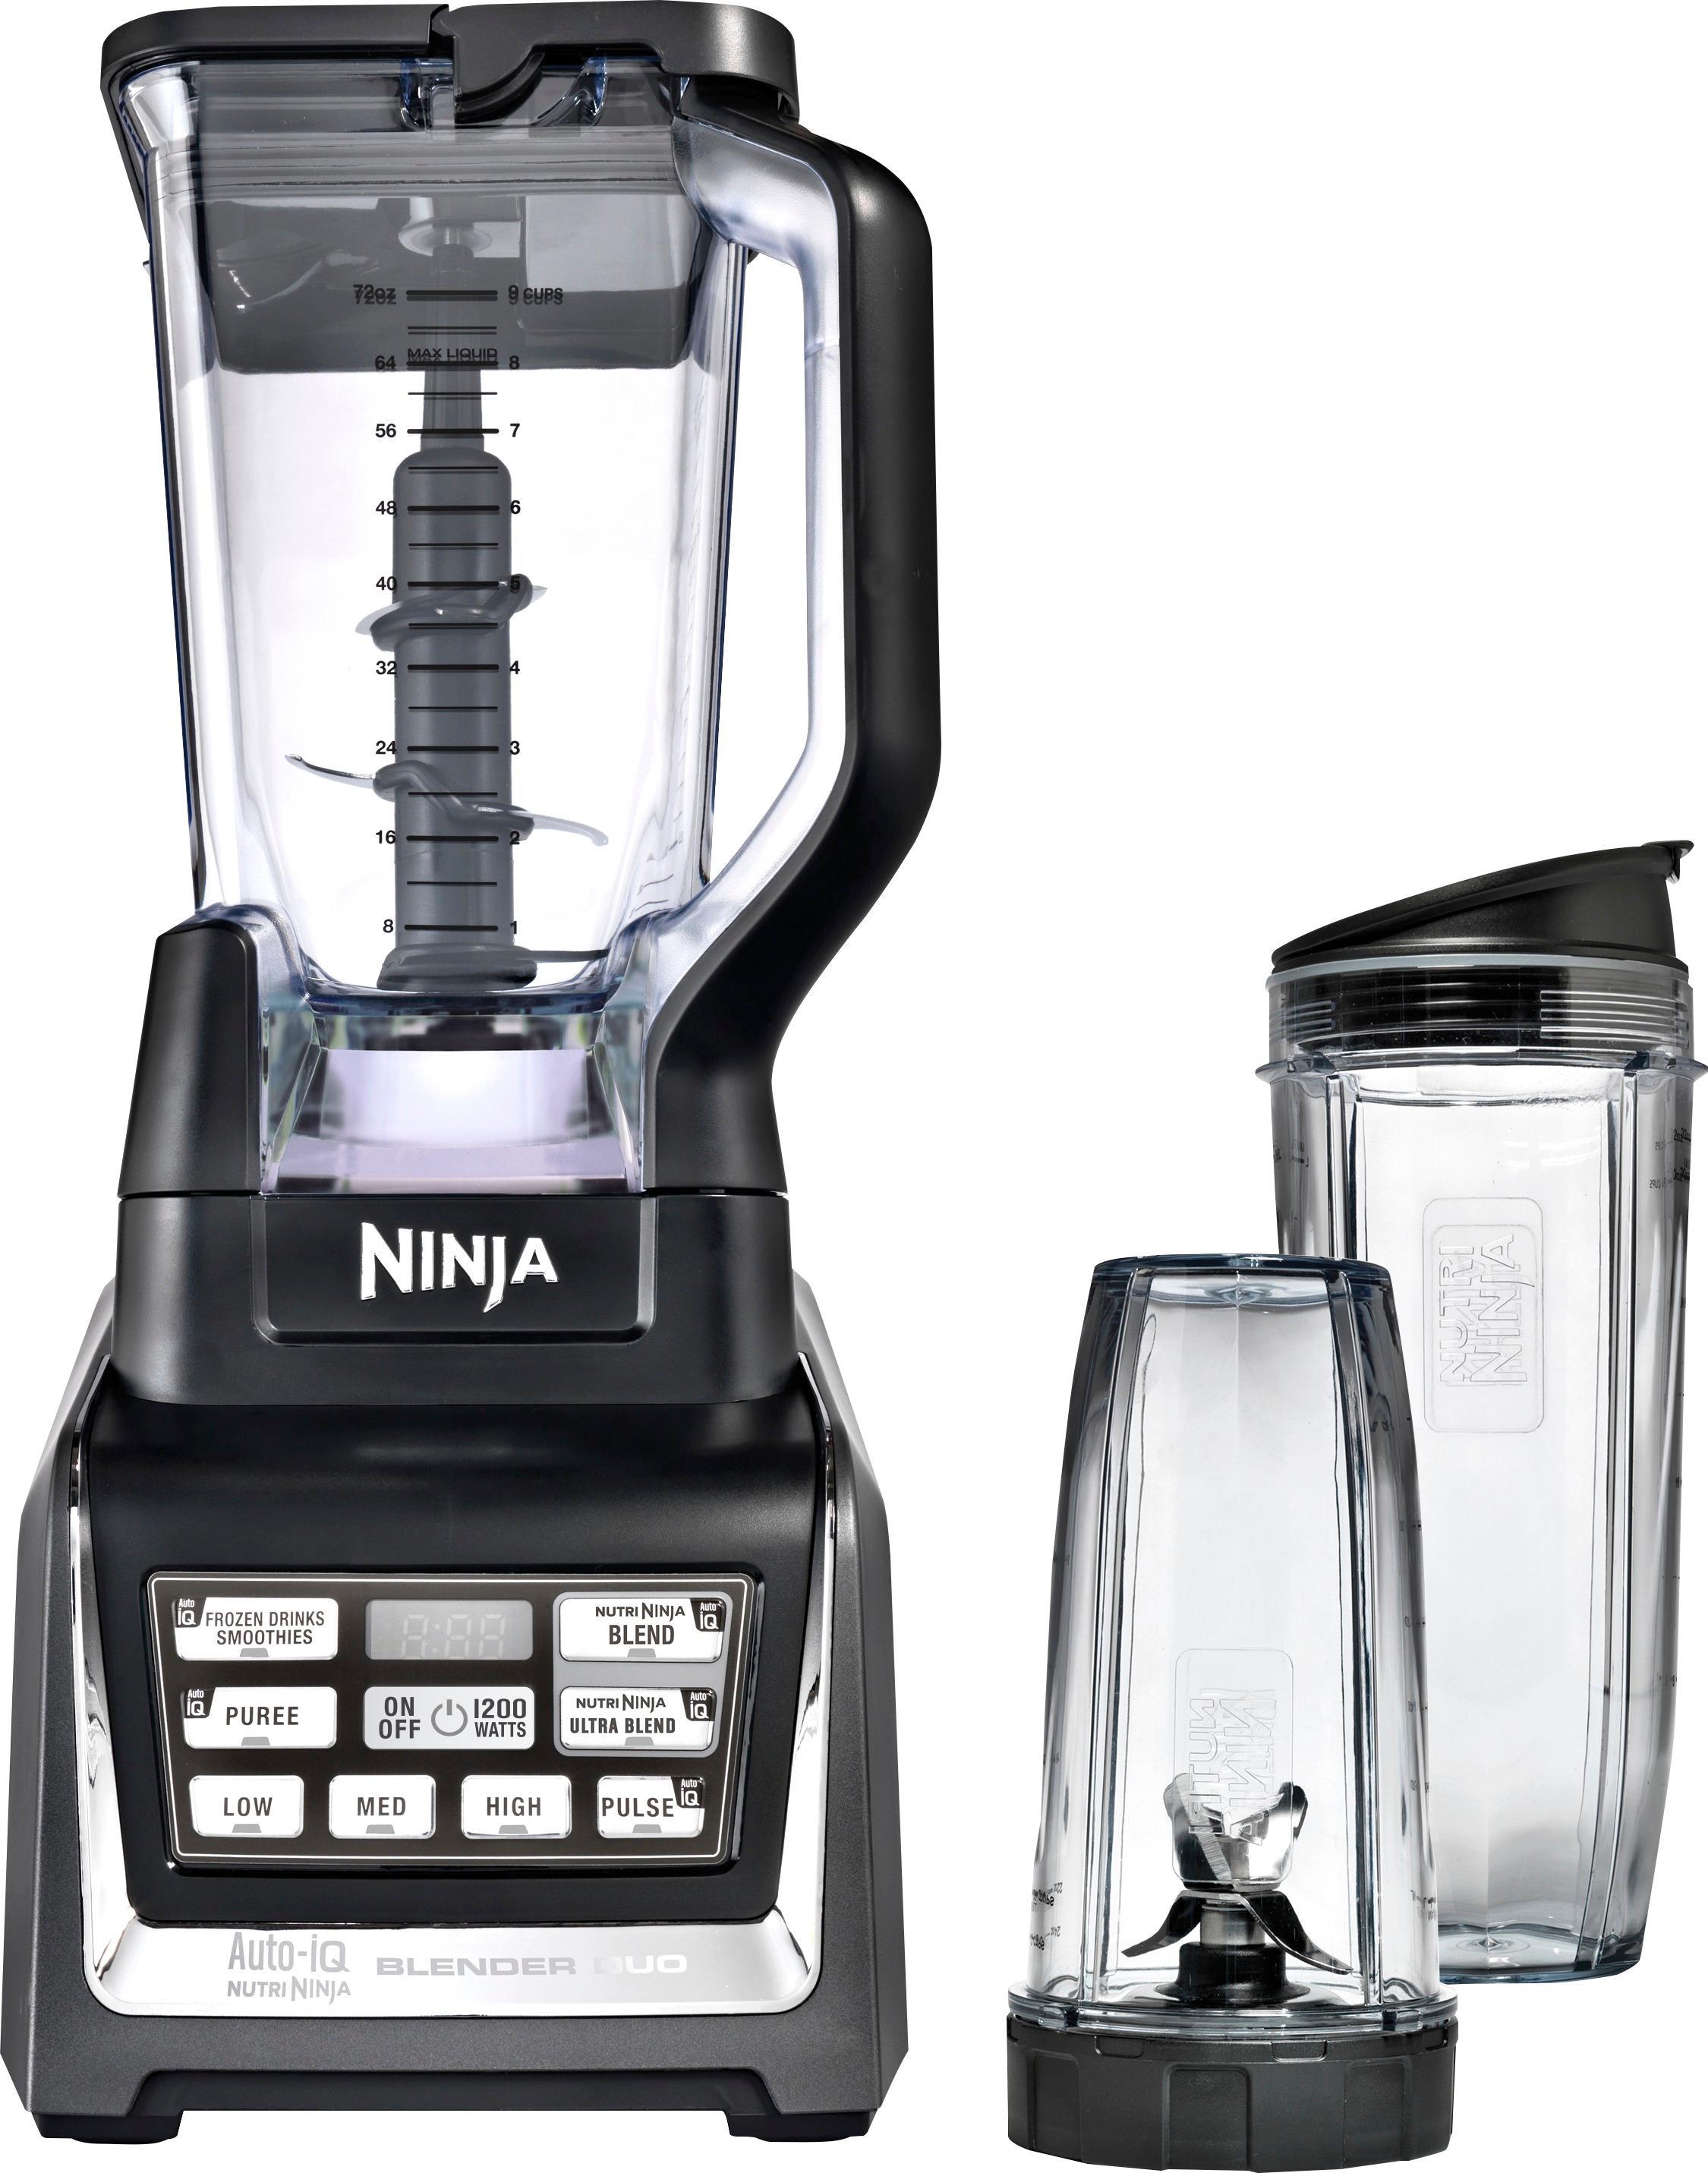 Ninja - Nutri Ninja 72-Oz. Blender Duo with Auto IQ - Black/Silver